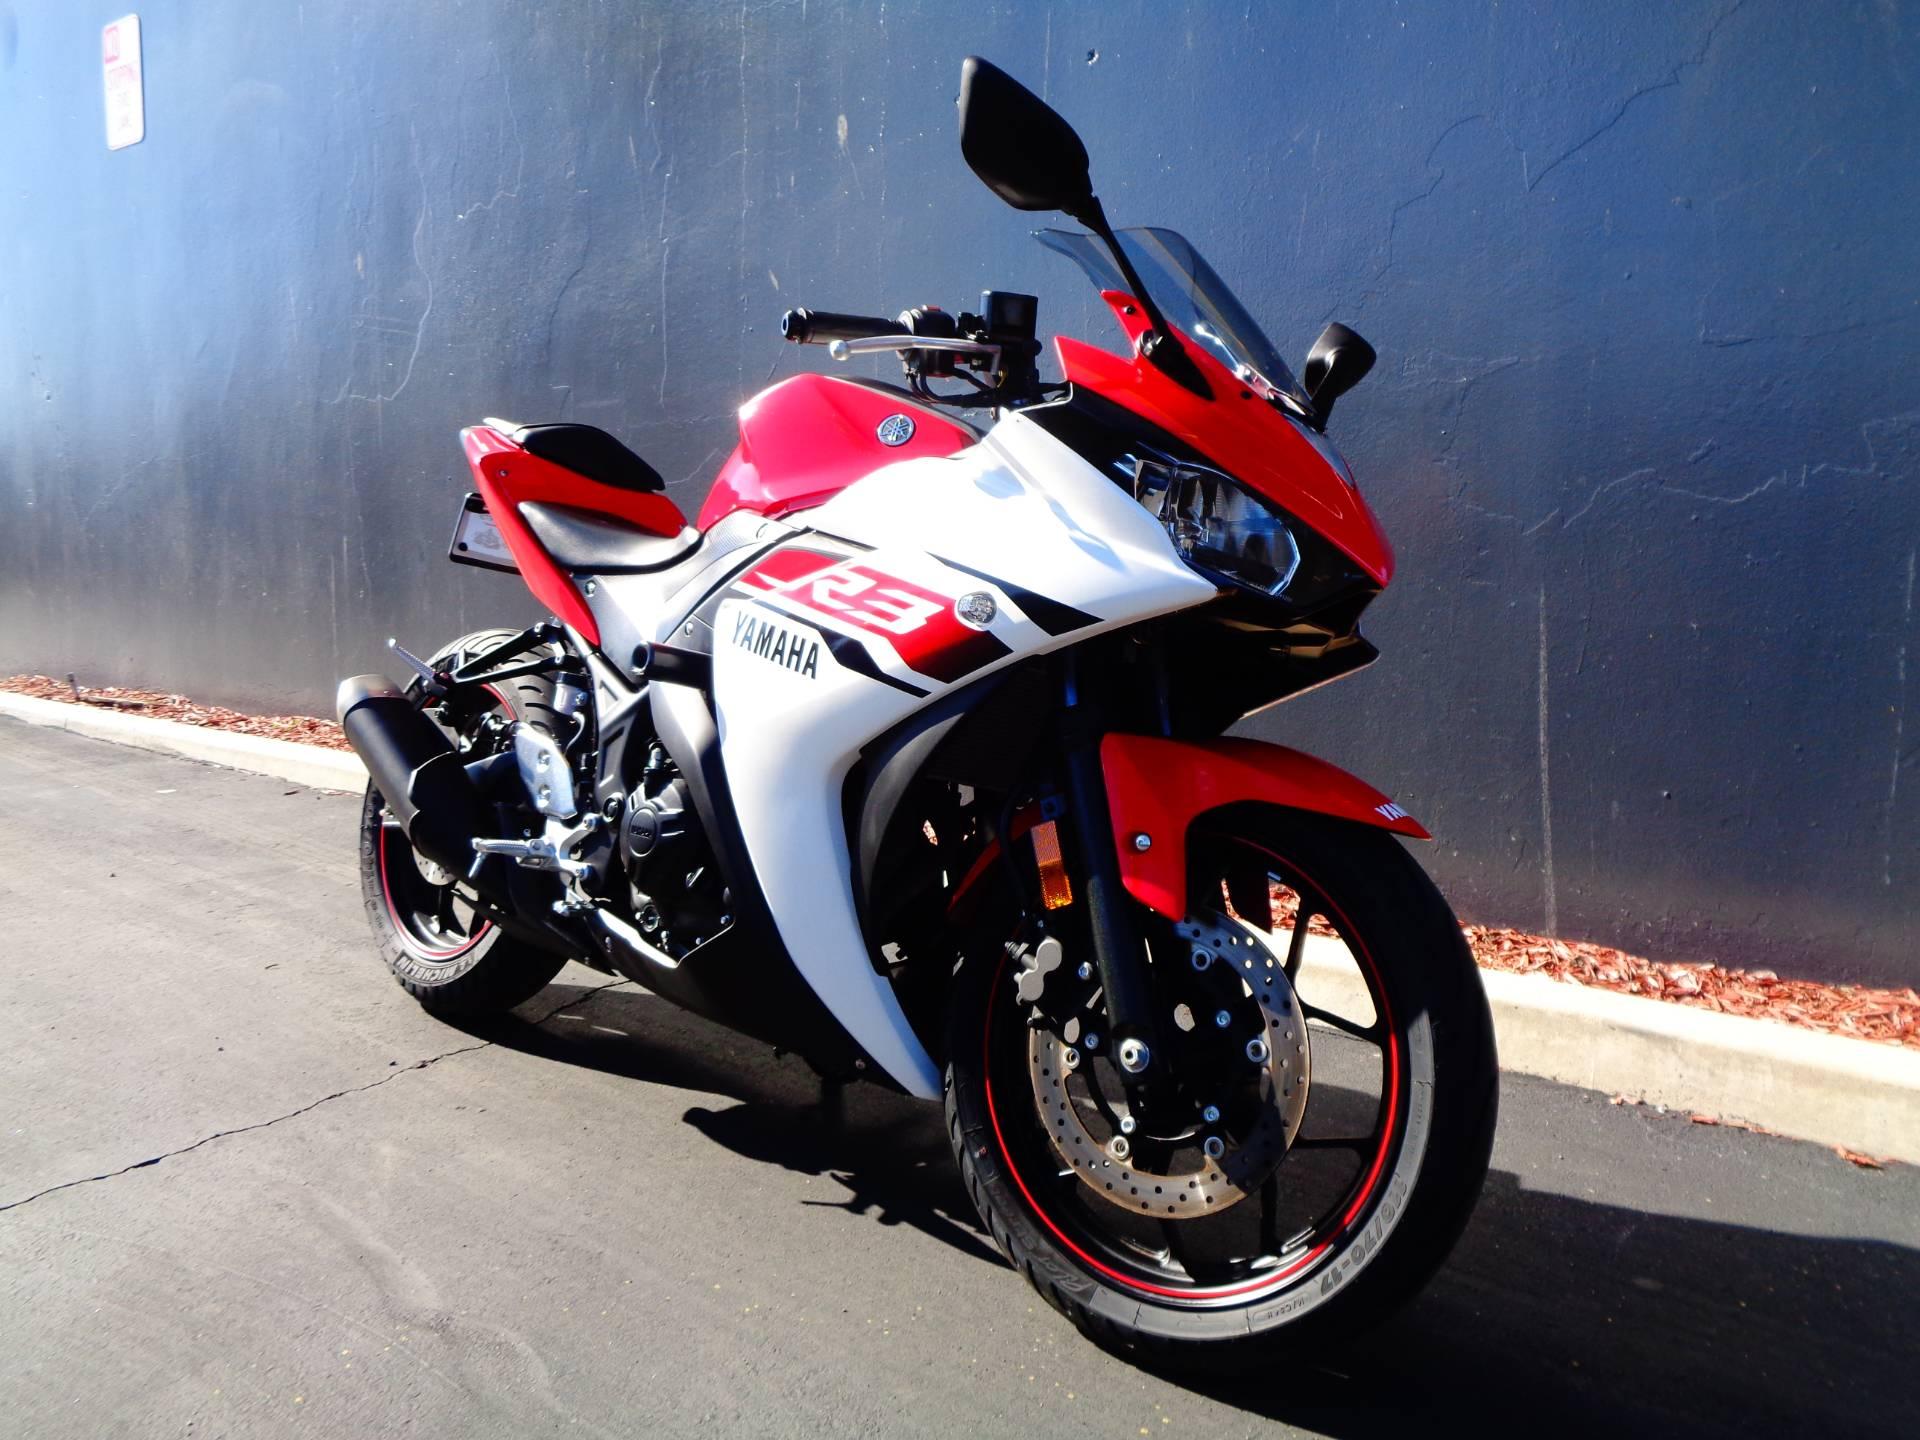 2015 Yamaha YZF-R3 for sale 89144